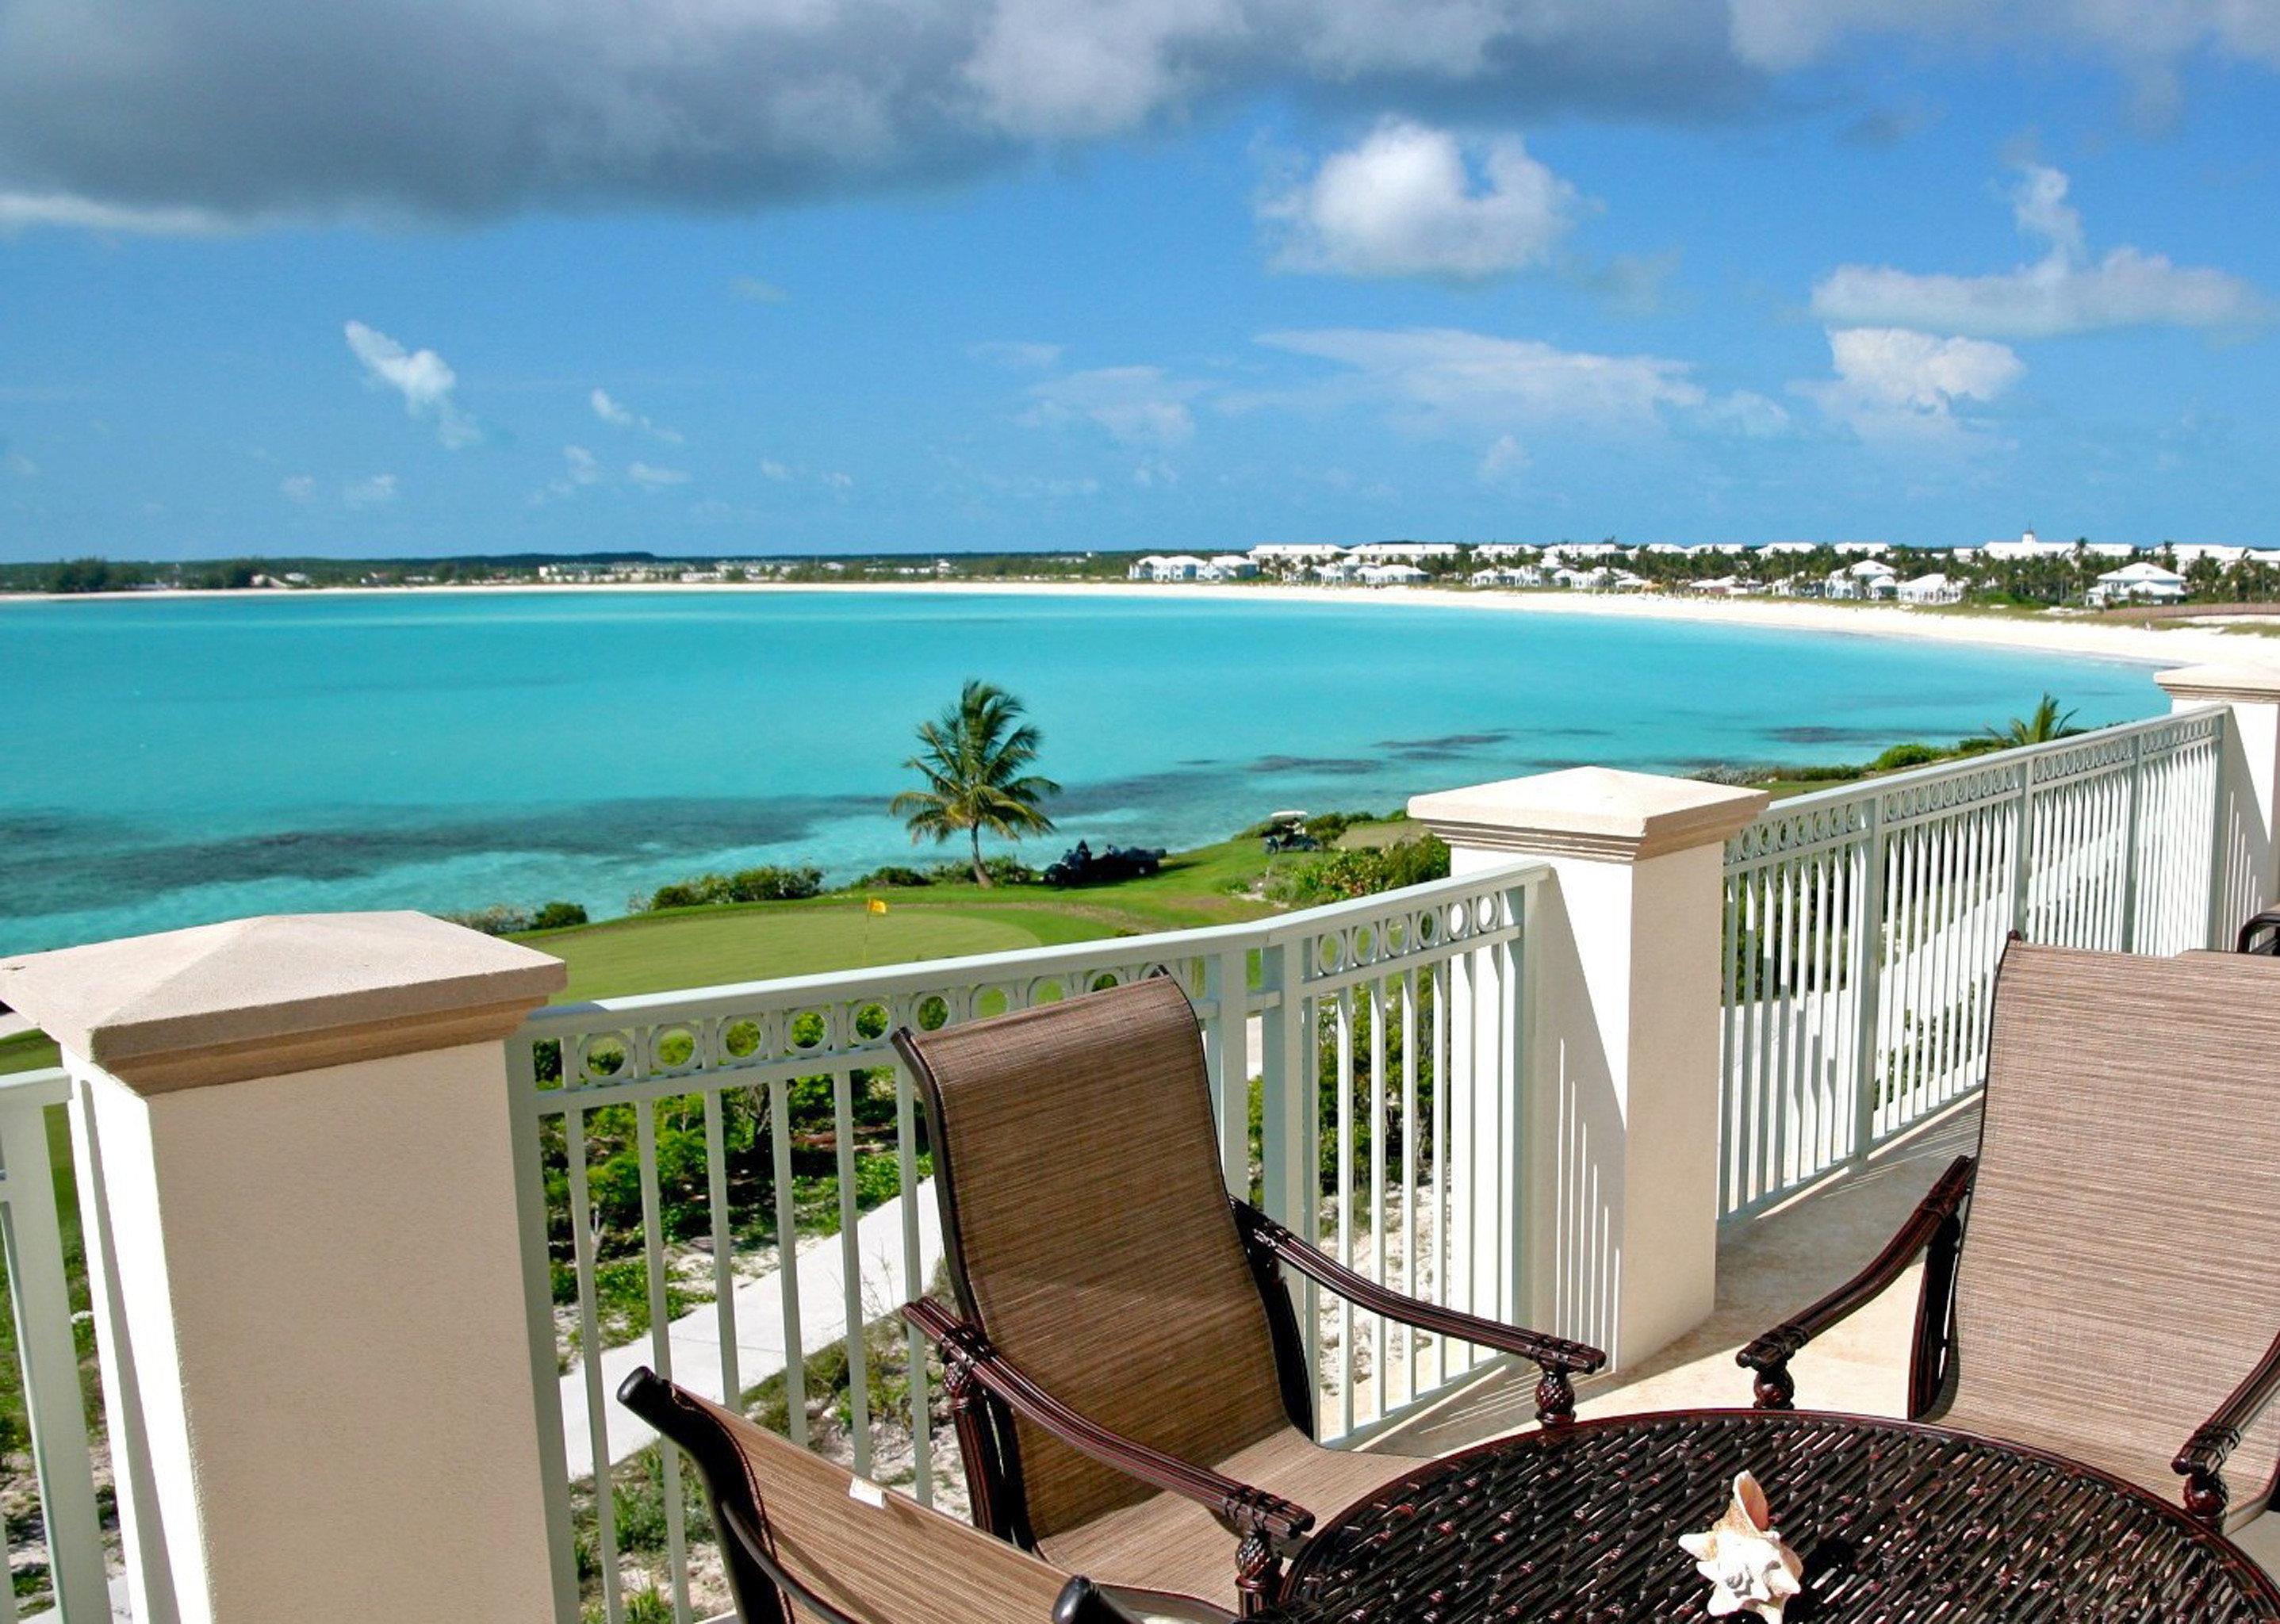 Beach Beachfront Honeymoon Resort sky chair property leisure swimming pool Deck Villa caribbean Balcony cottage overlooking shore